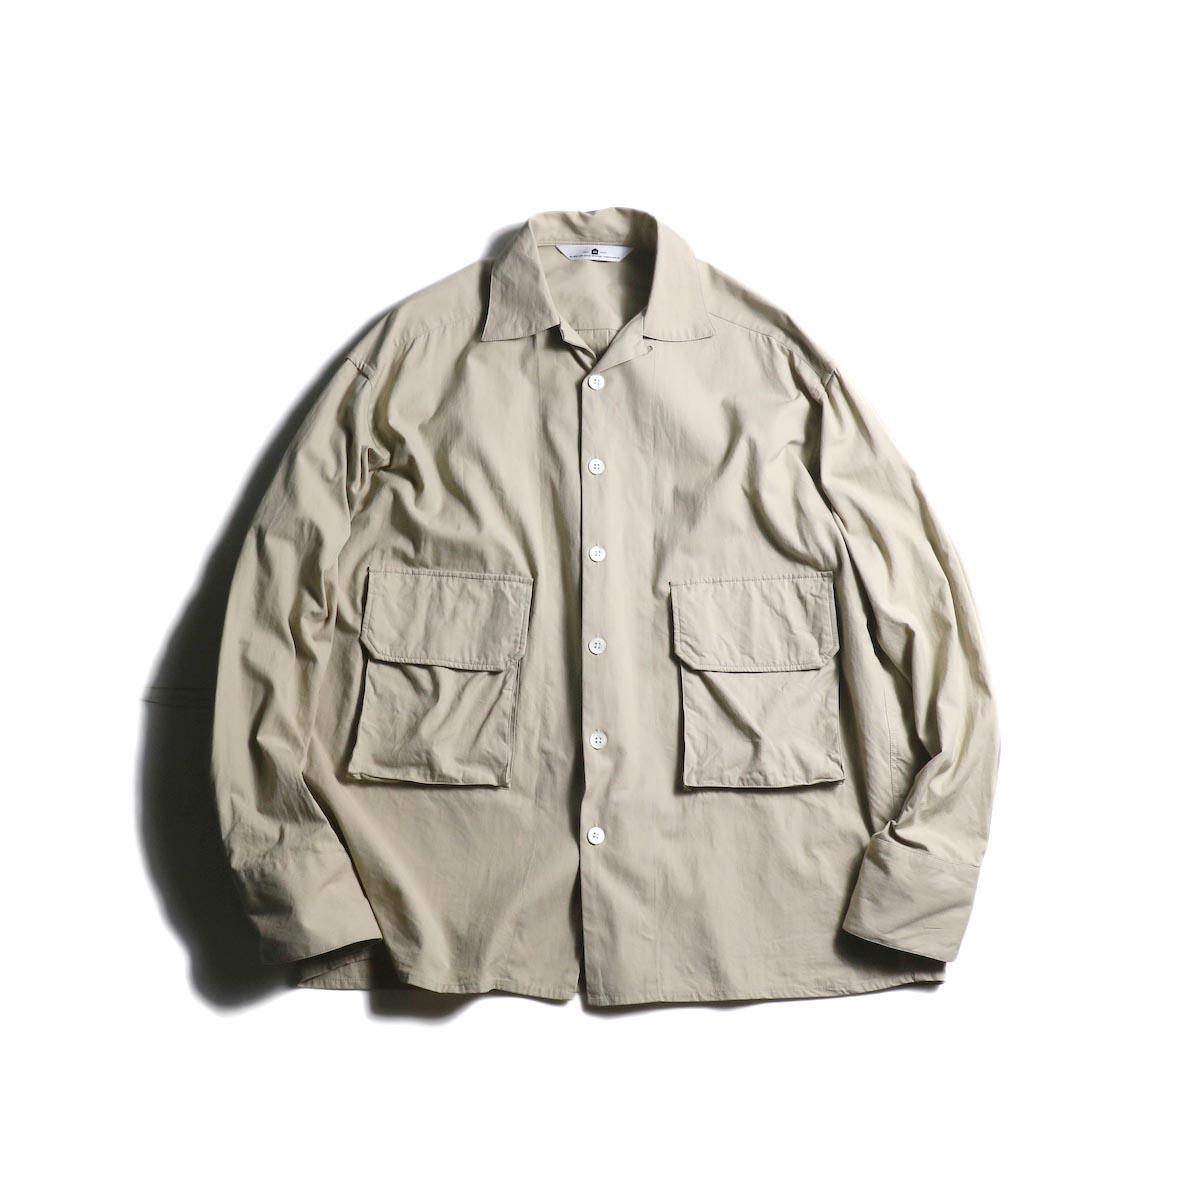 SGGM / Loop-top Shirt Flap Pocket (Beige Twill)